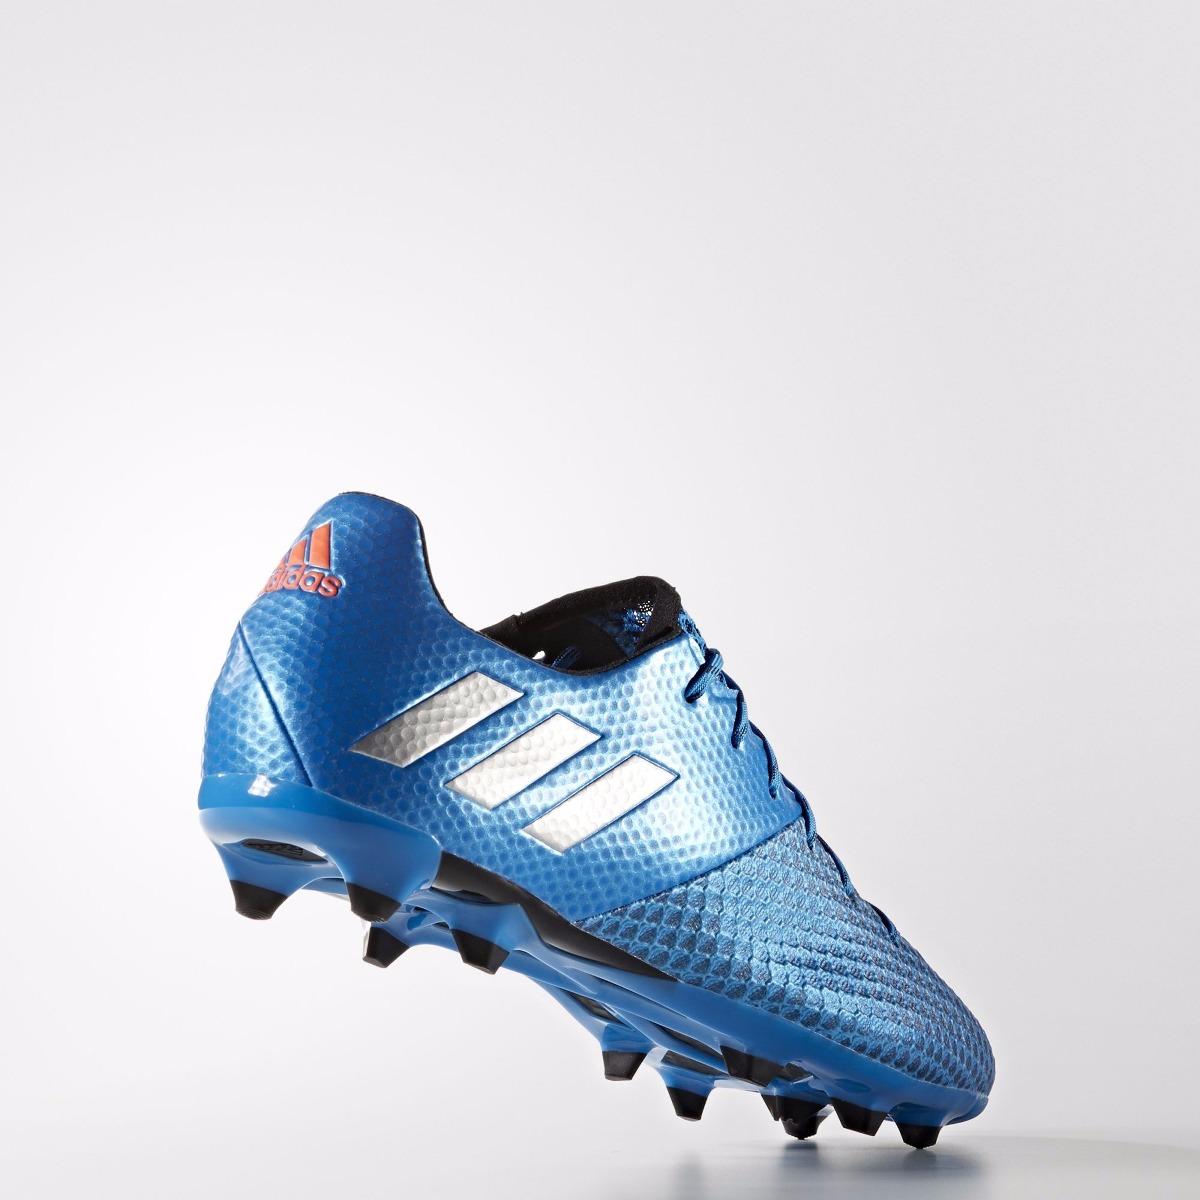 00 2 999 Adidas Zapatos Futbol Aq3111 Semiprofesionales Messi 16 gwxqw8nAOp